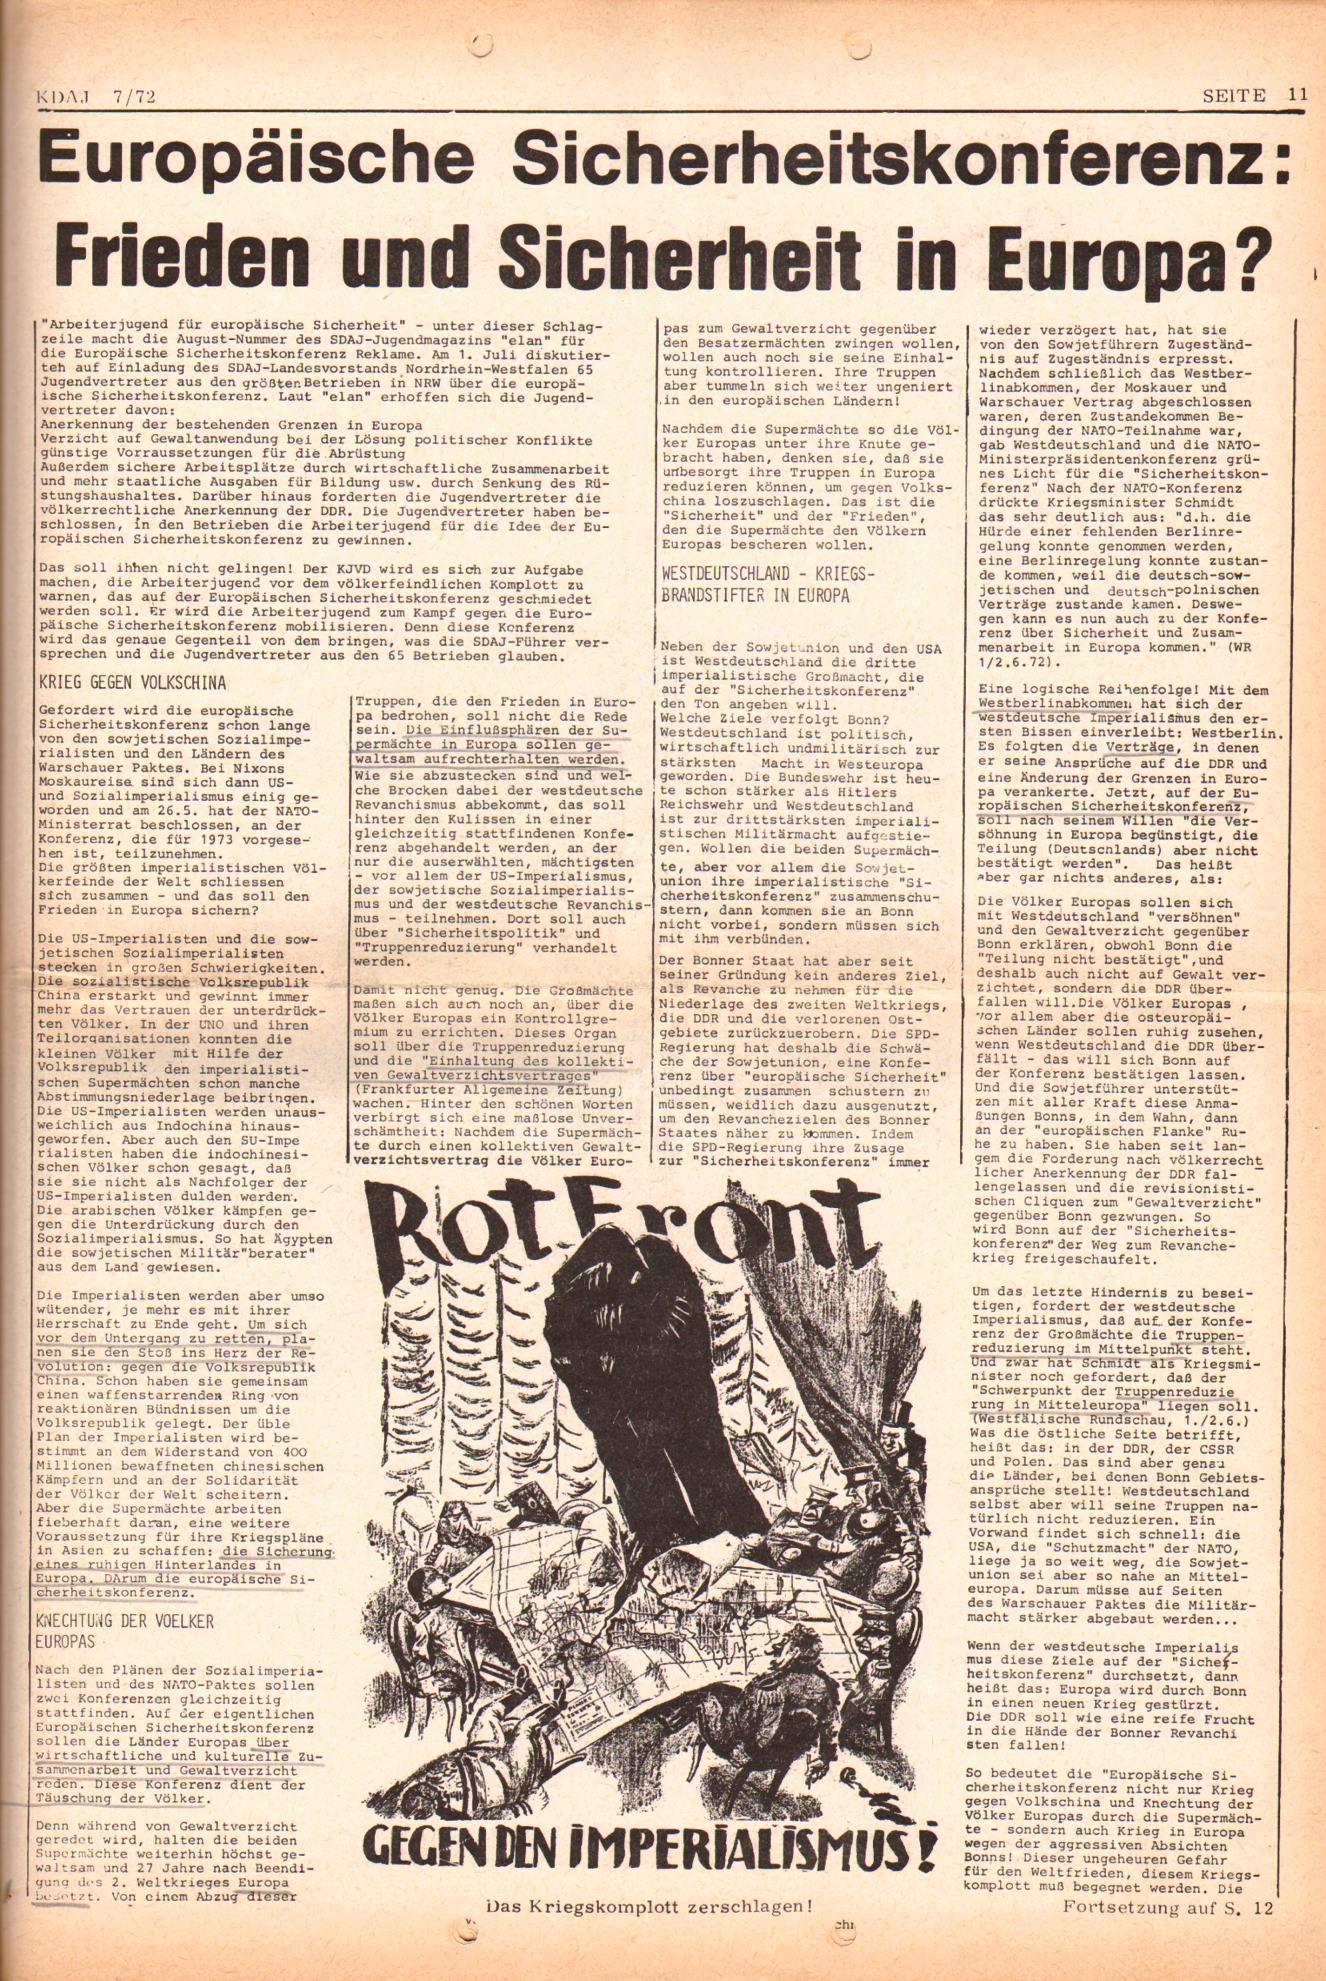 KDAJ, 3. Jg., August 1972, Nr. 7, Seite 11